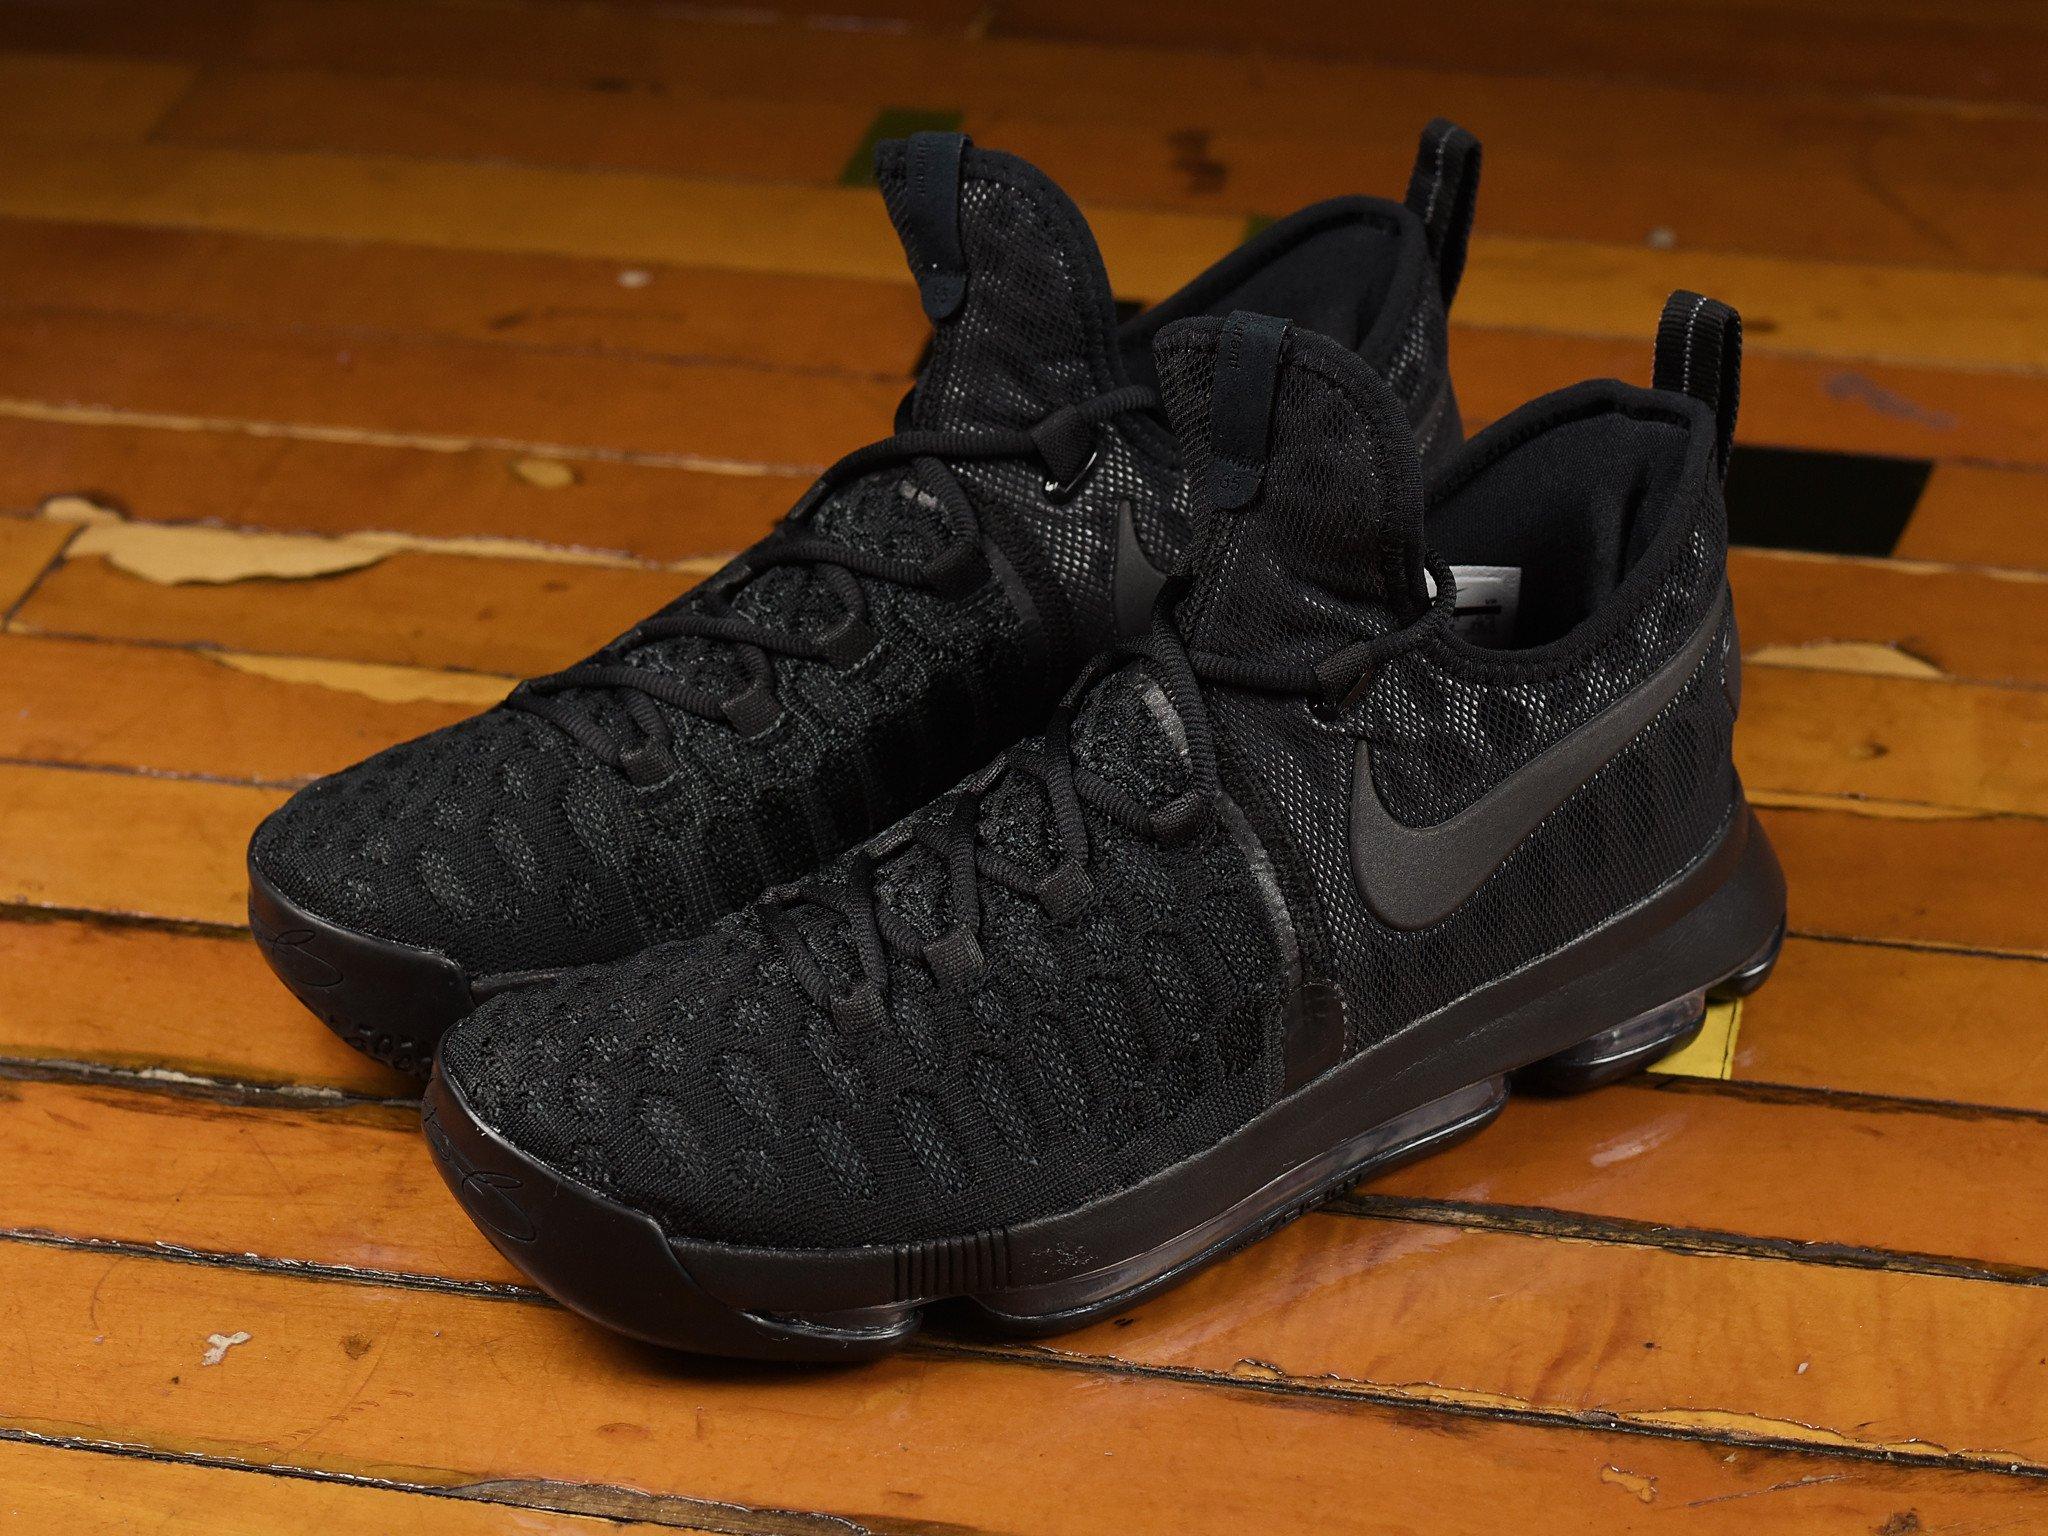 sports shoes 24c35 25cbc greece nike kd 9 release ec6eb a38e5